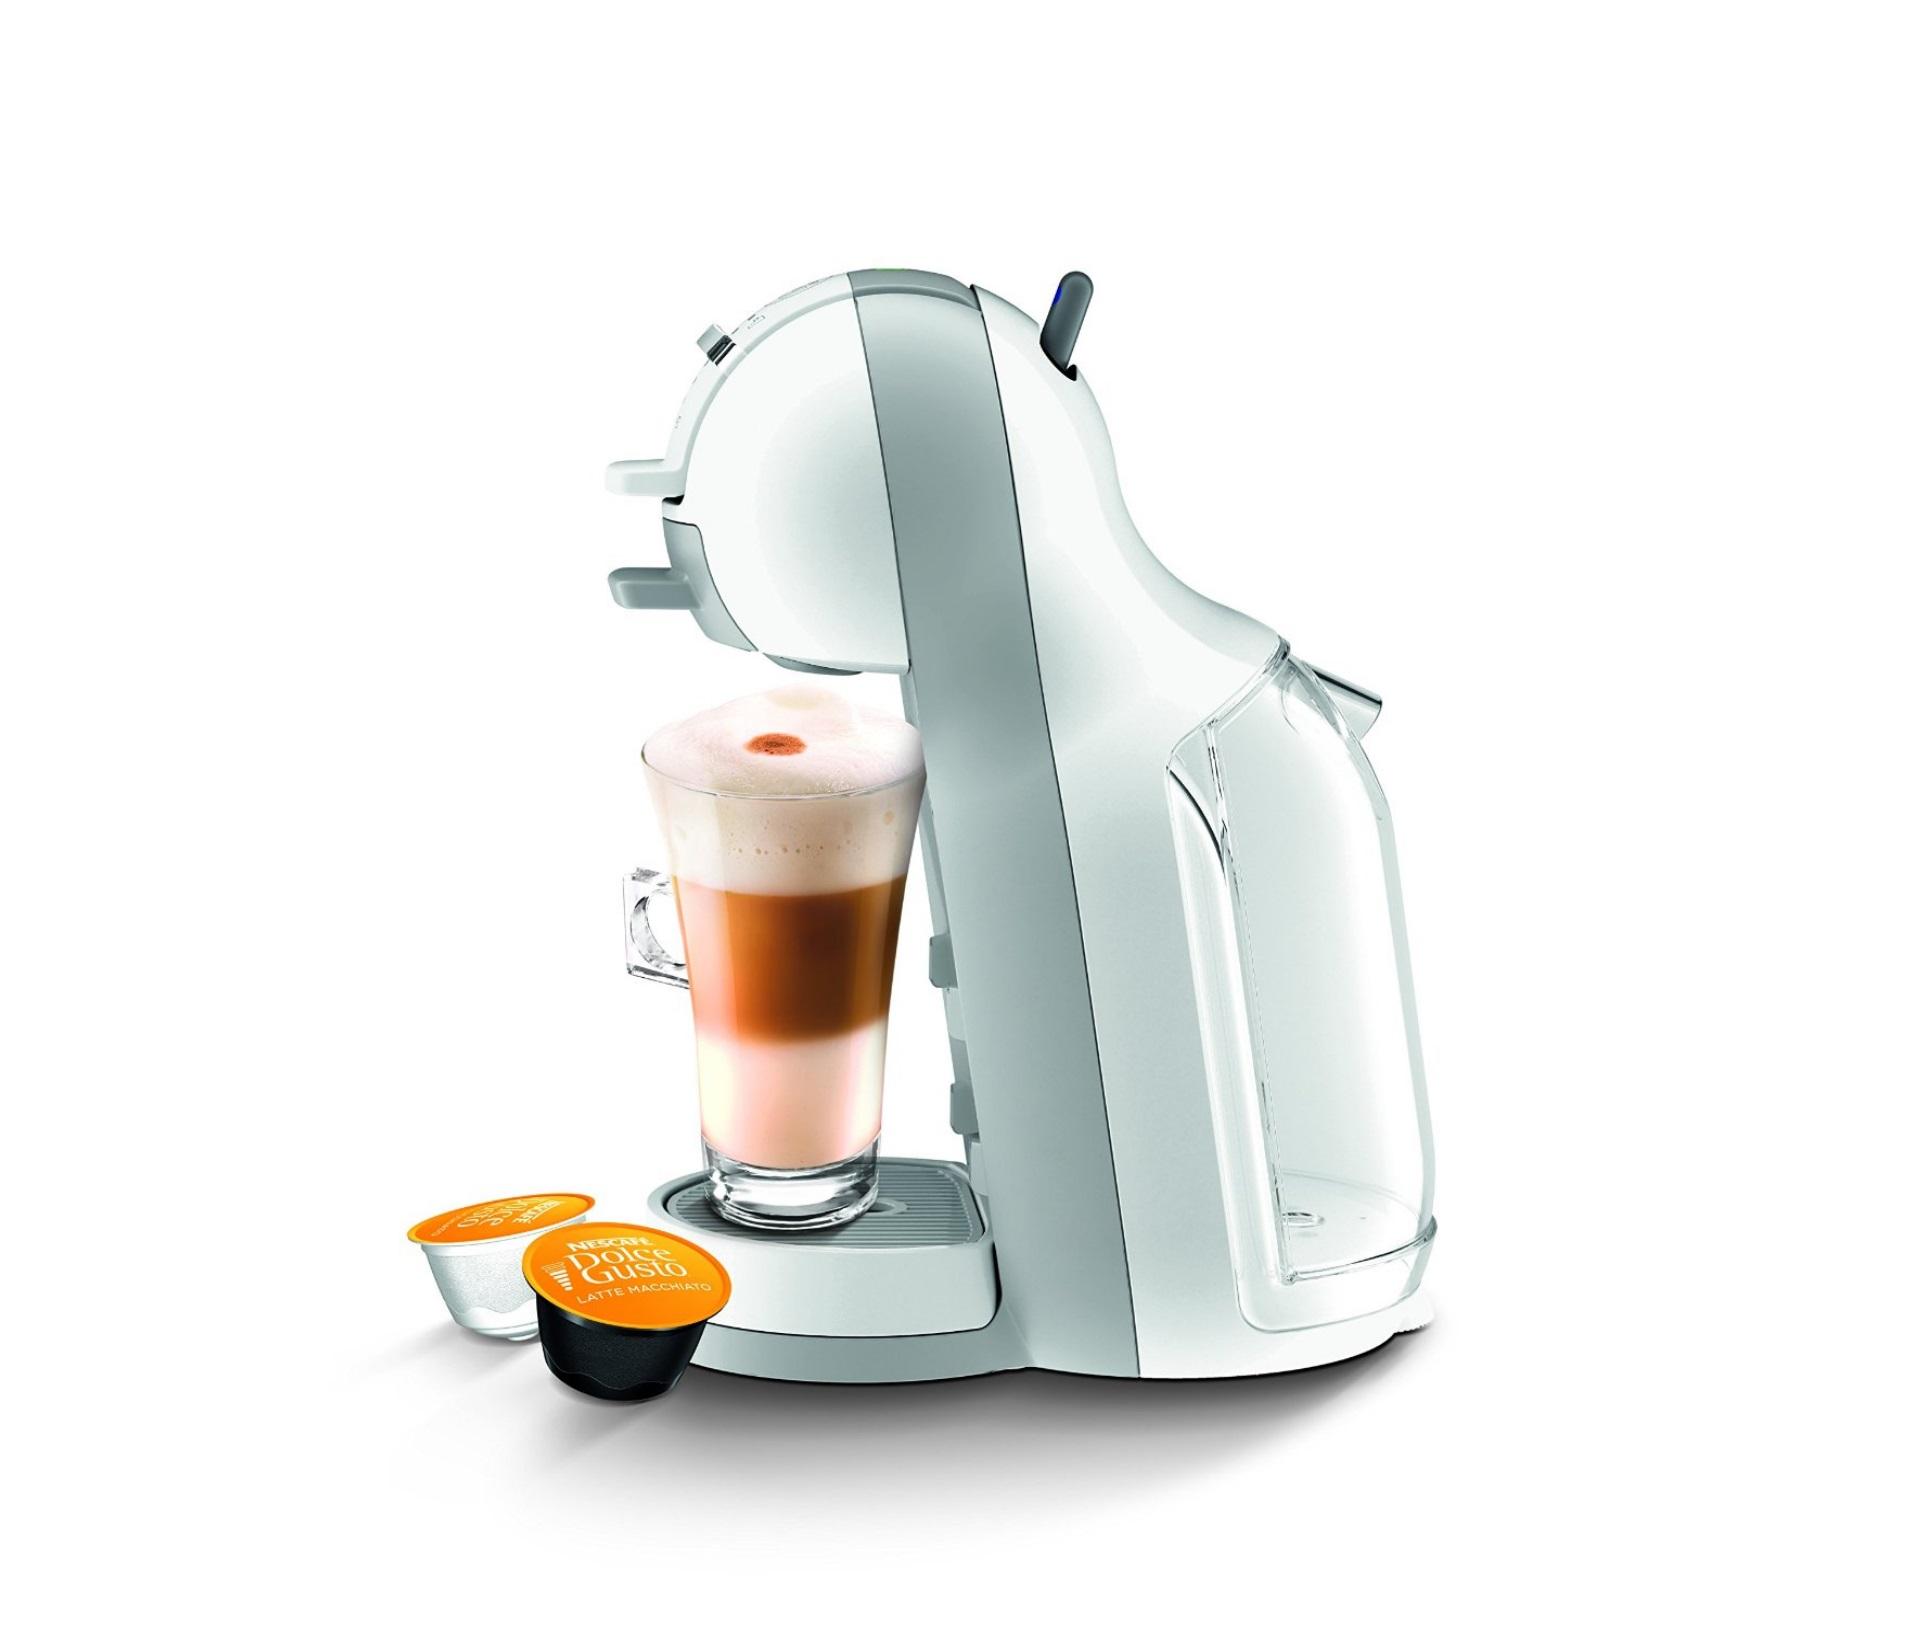 Krups-KP-1201-Nescafé-Dolce-Gusto-Mini-Me-1 Dolce Gusto Mini Me